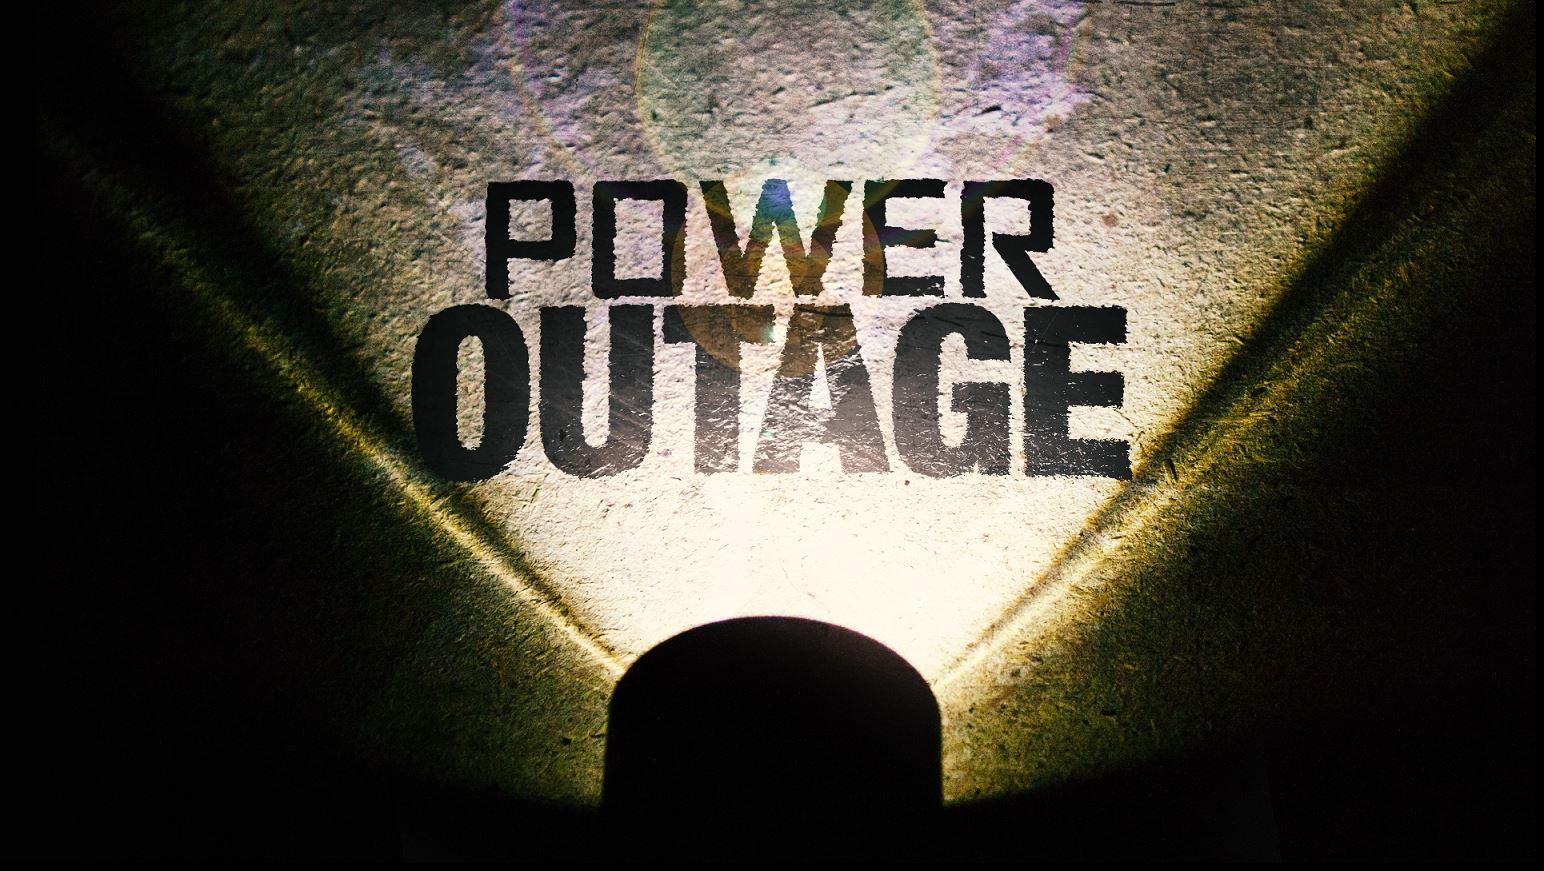 power outage_1536847478770.JPG-873810377-873810377.jpg